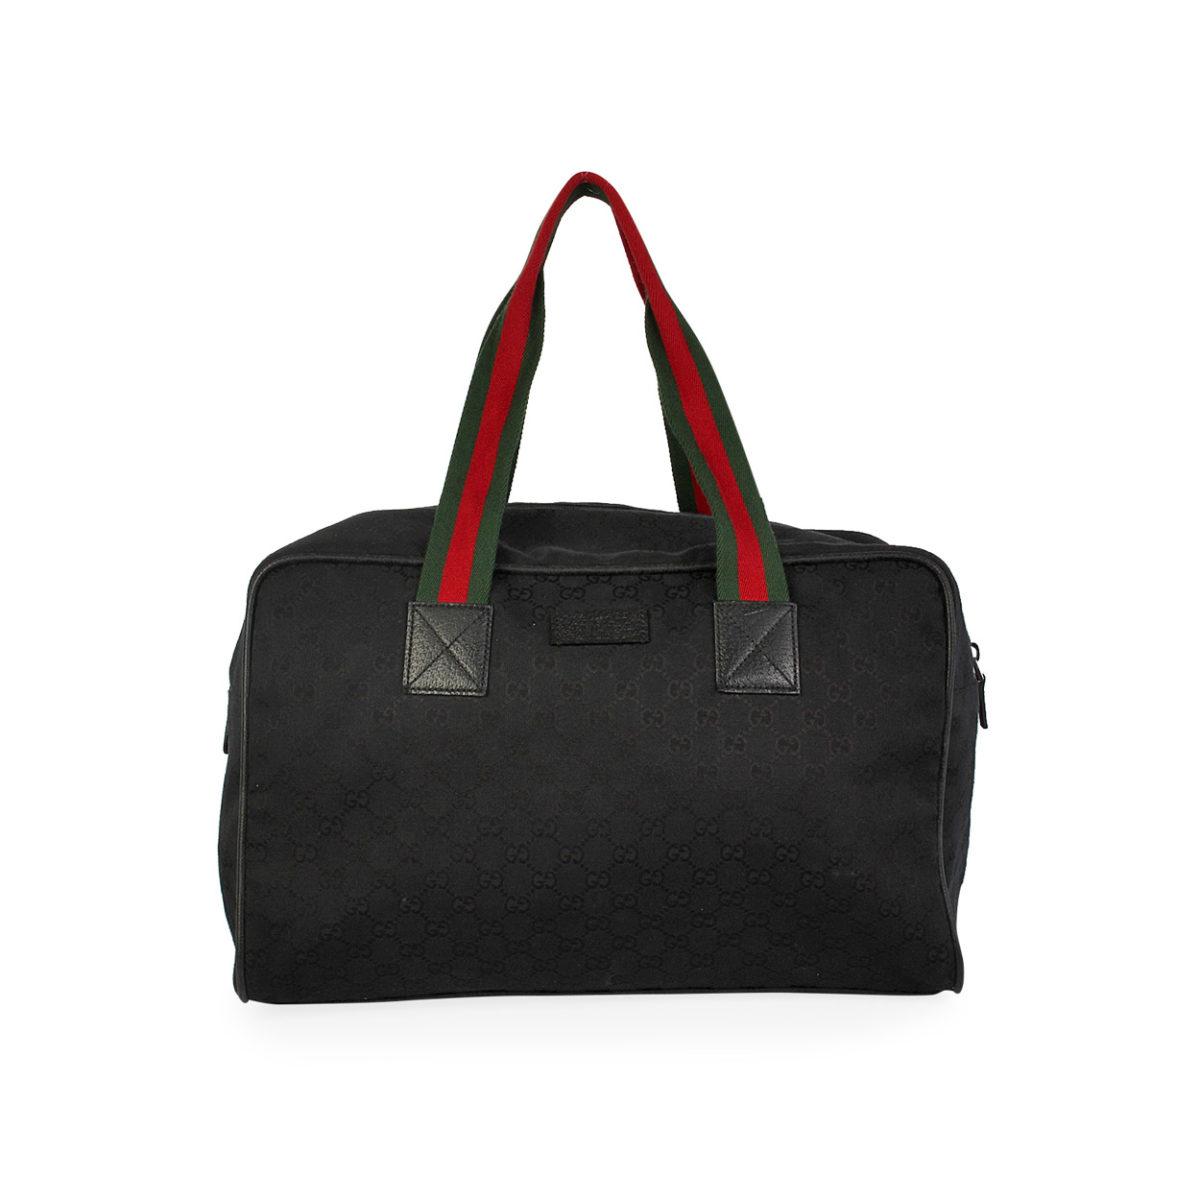 be7e466e410e GUCCI GG Large Duffle Bag Black | Luxity